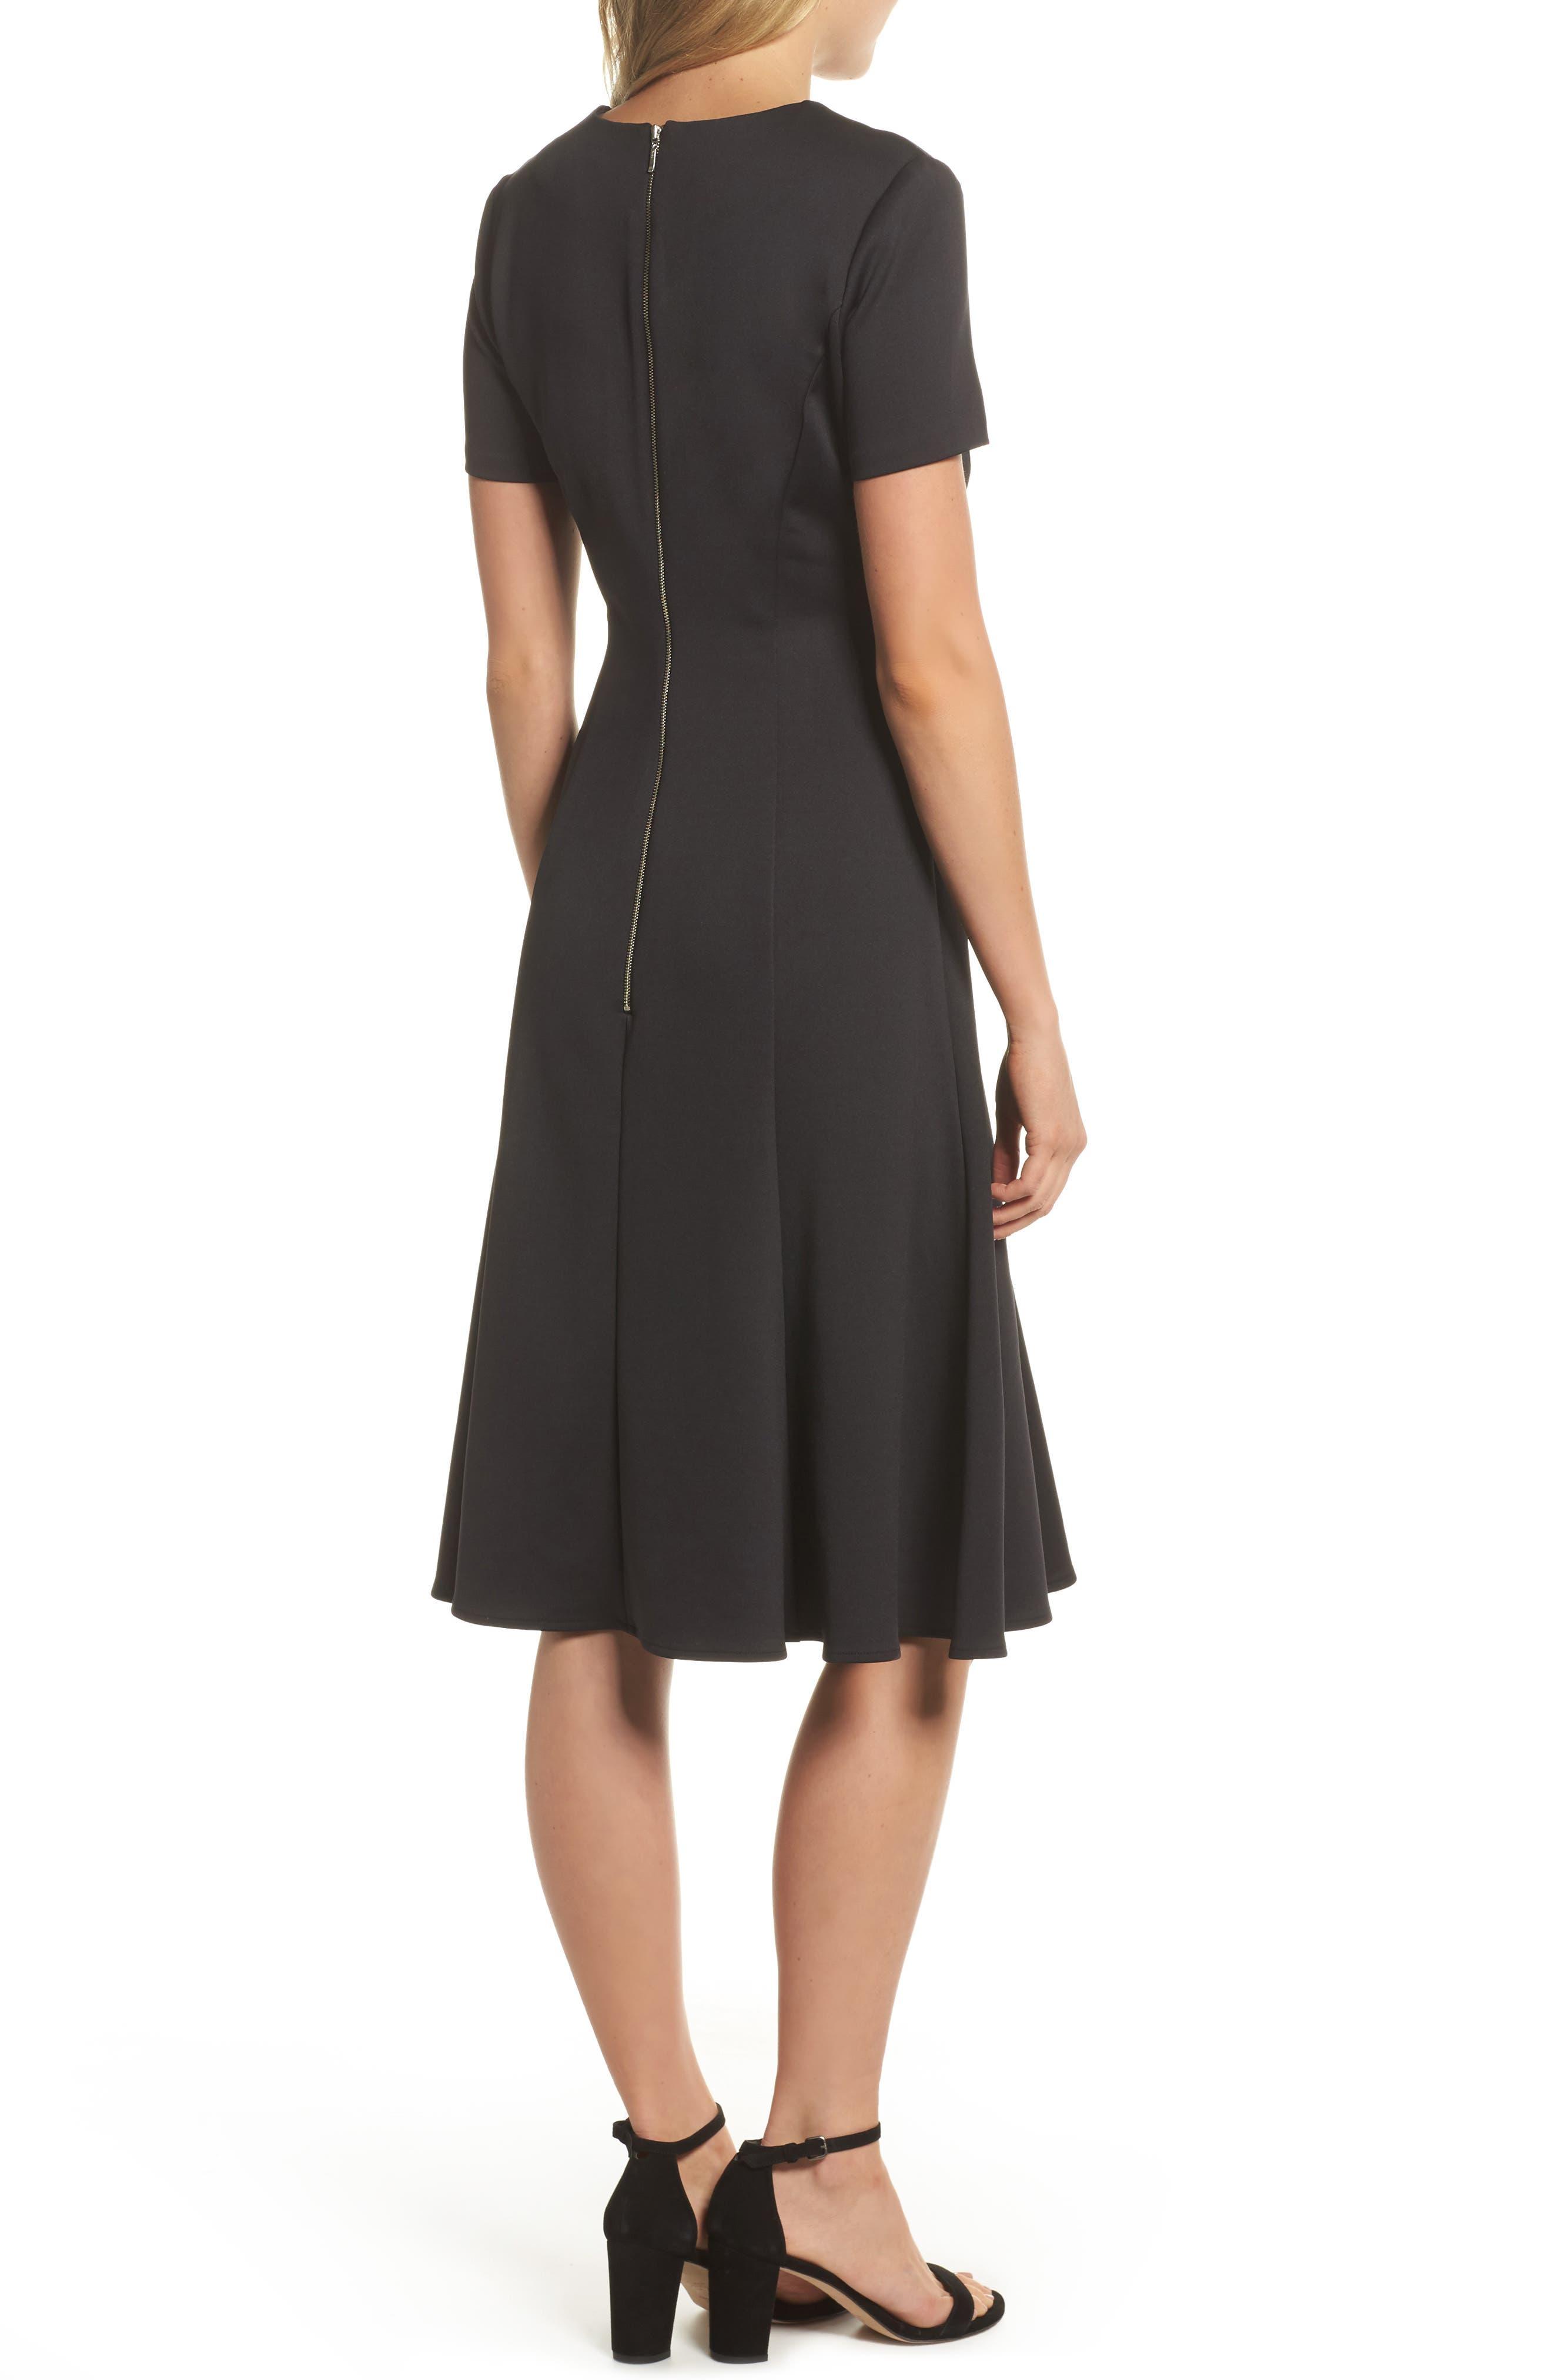 Midi Bell Dress,                             Alternate thumbnail 2, color,                             Black